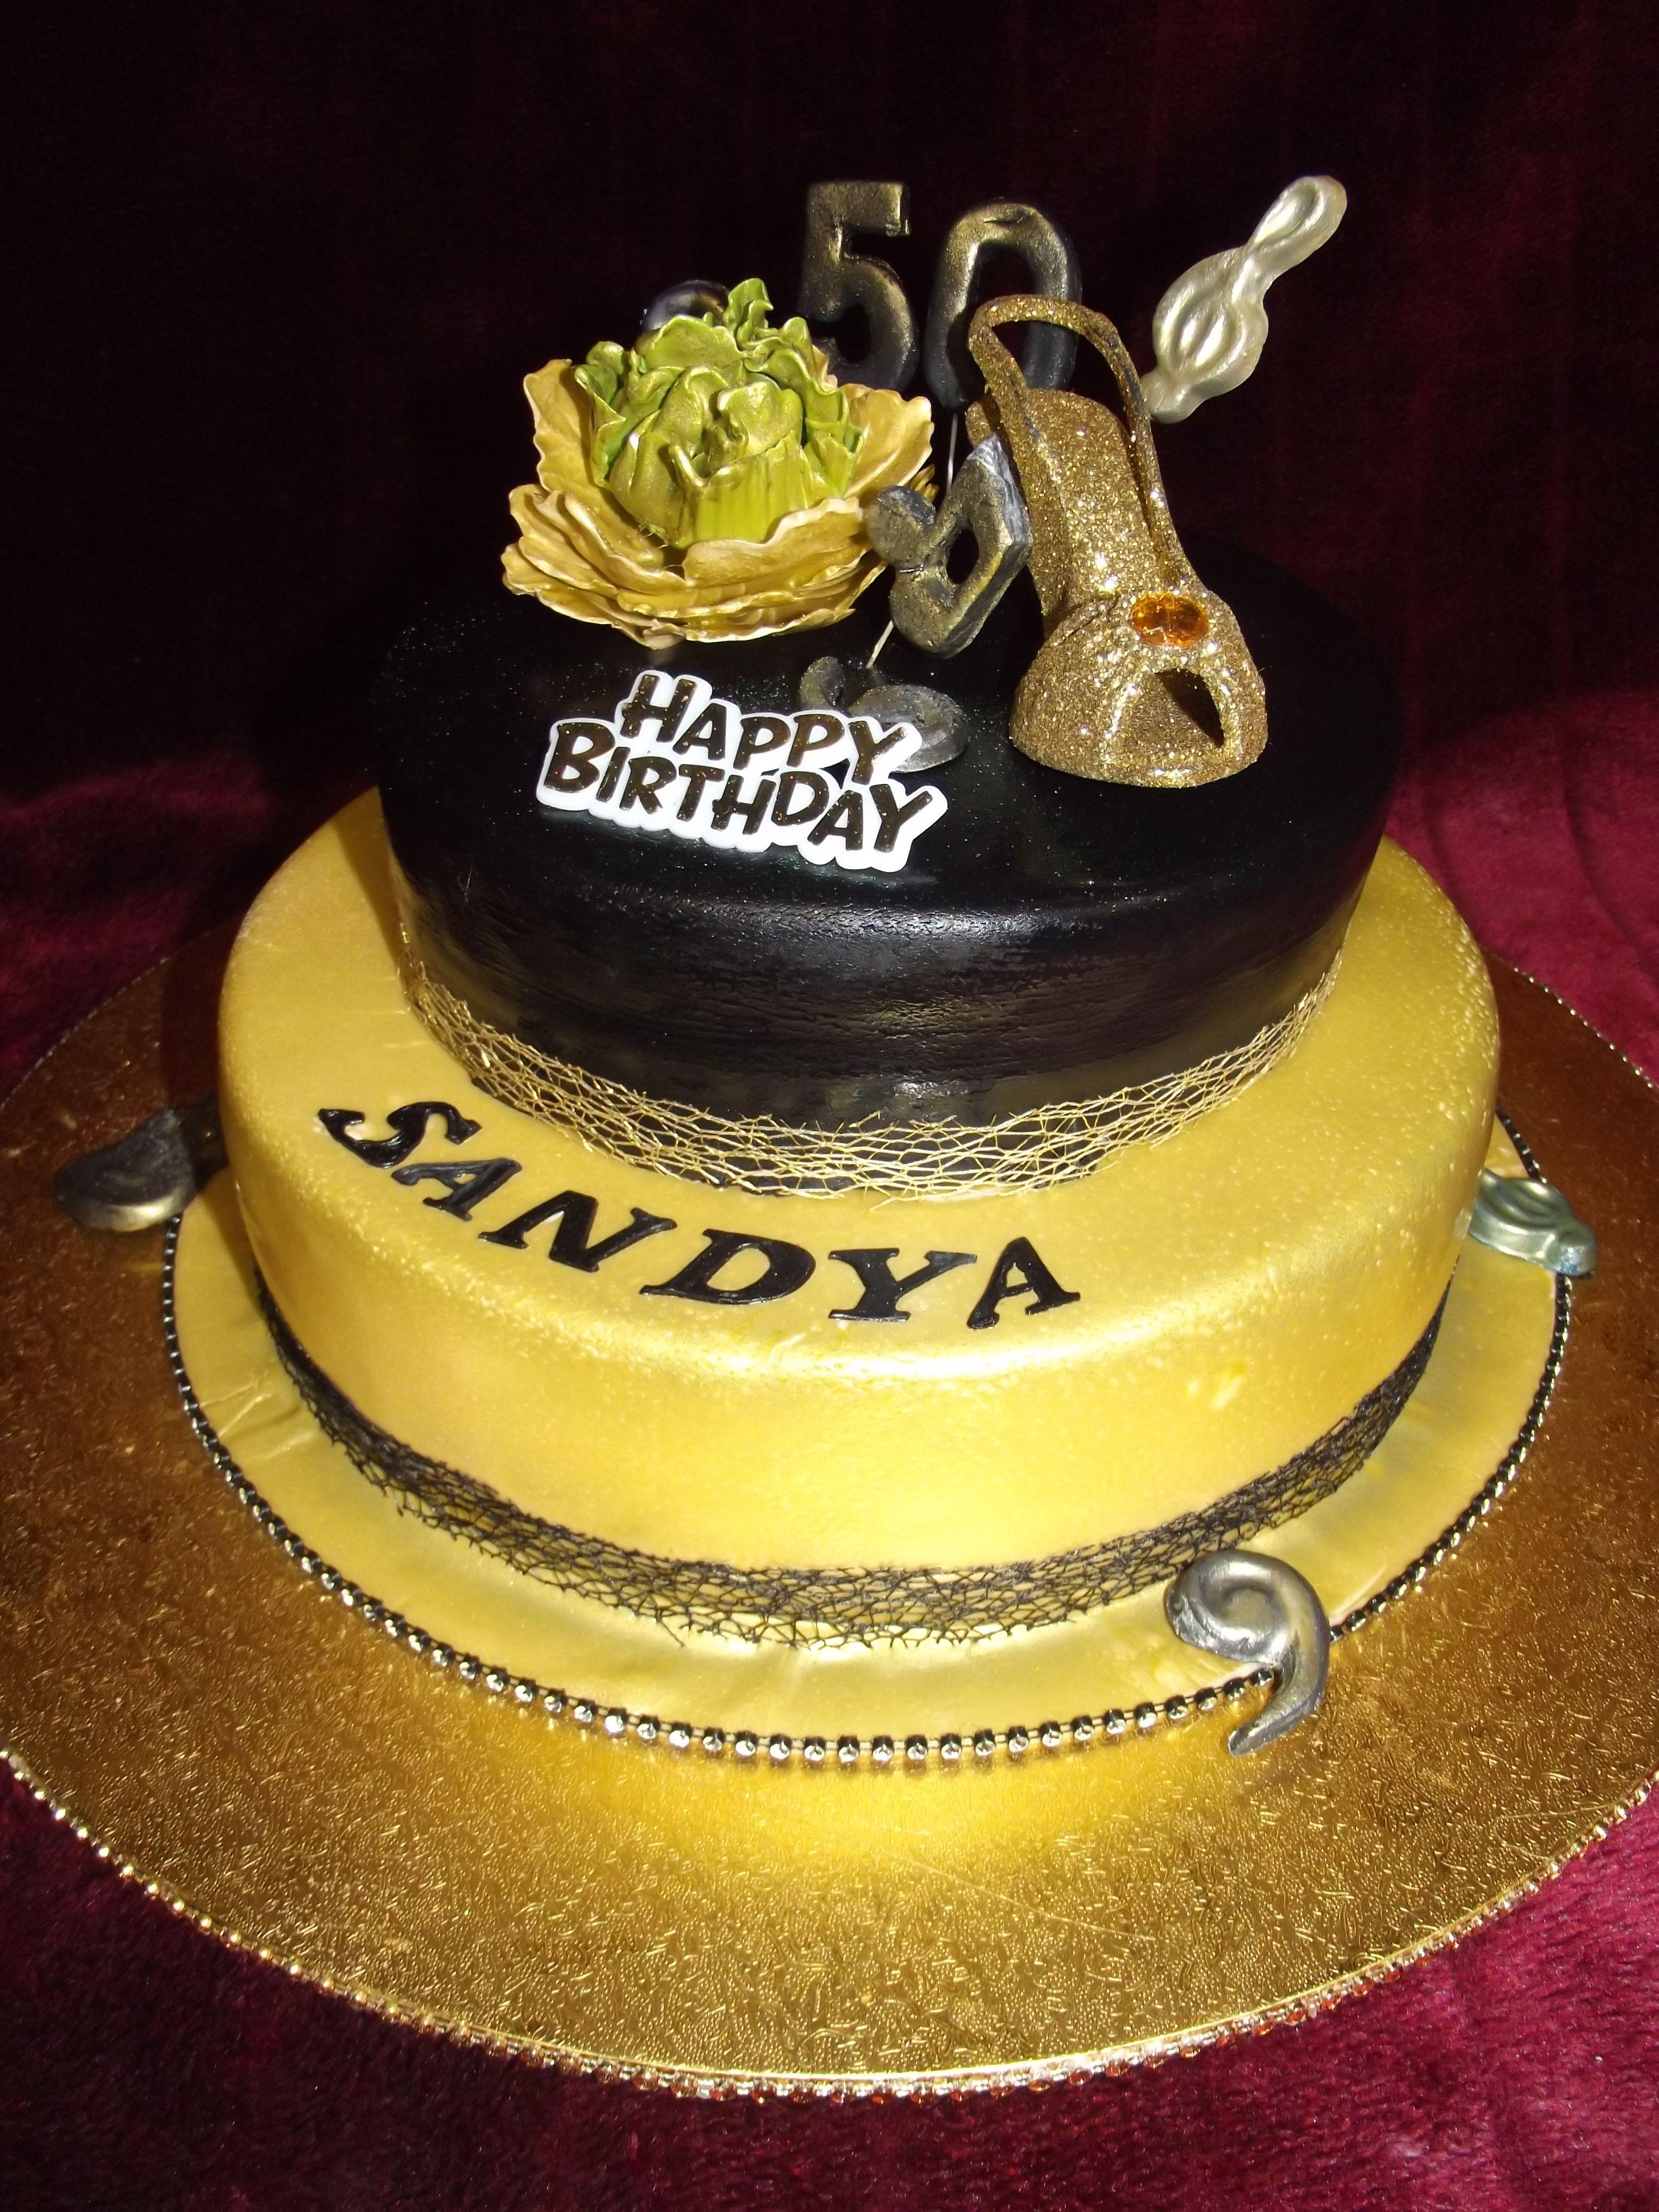 50th Birthday Cake For Sandya Frescofoods Email Fresco